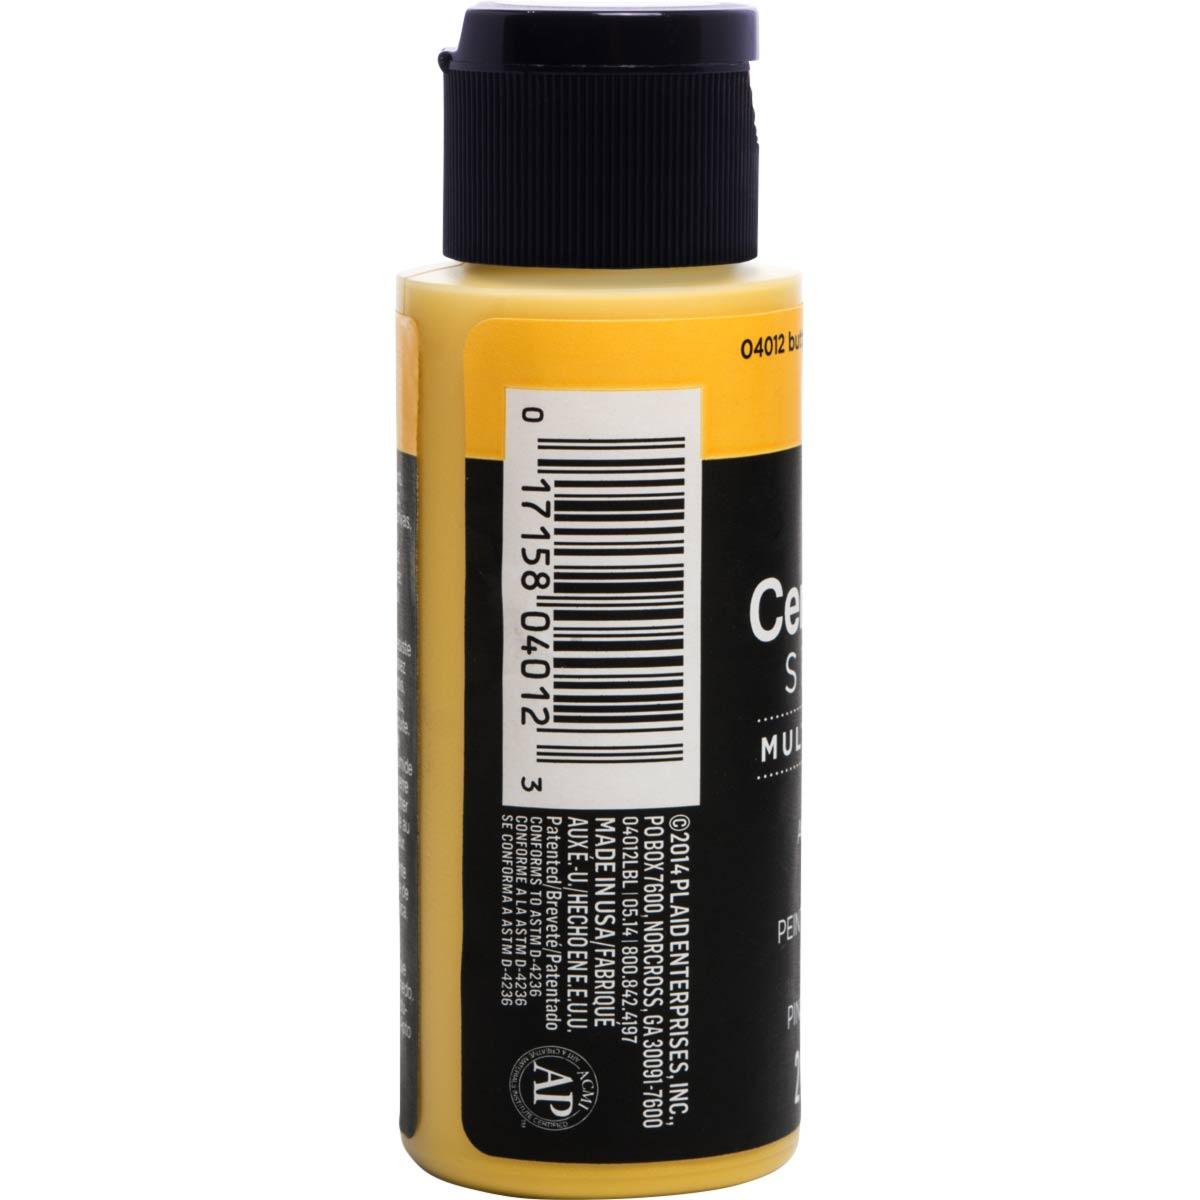 Delta Ceramcoat ® Select Multi-Surface Acrylic Paint - Satin - Butternut, 2 oz.